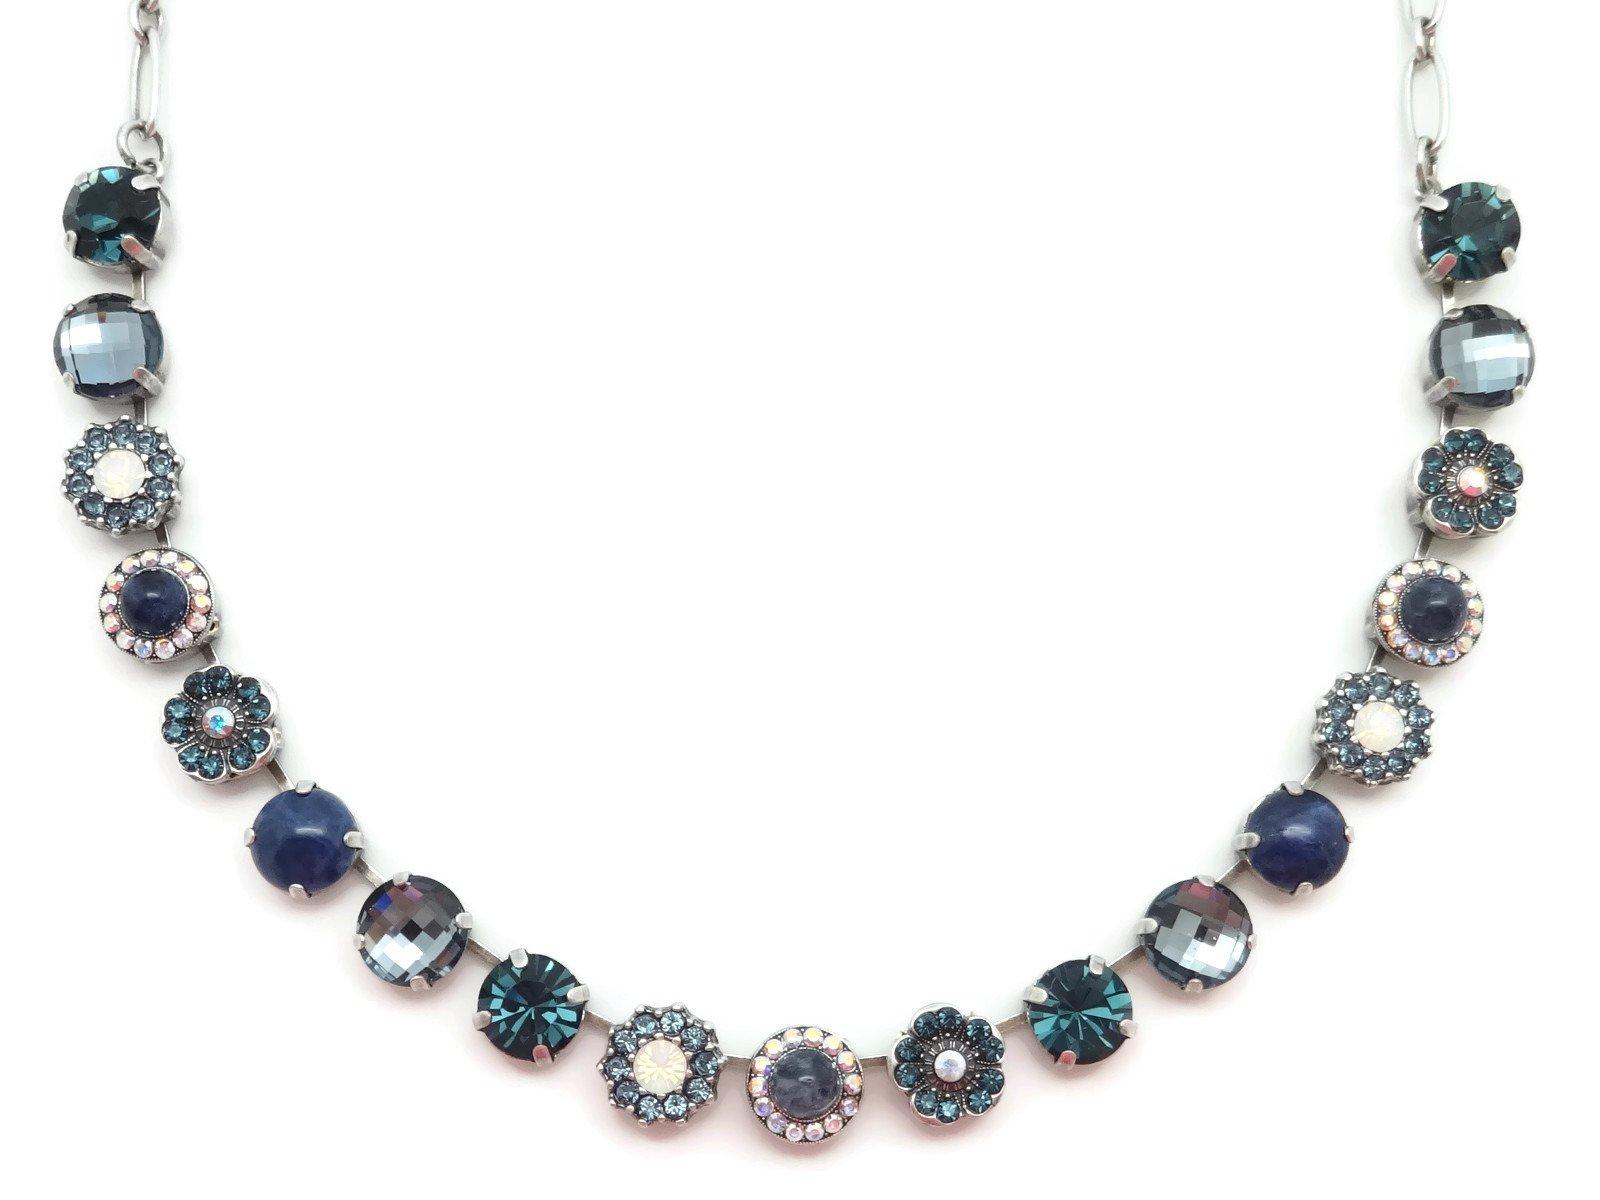 Mariana Swarovski Crystal Silver Plated Necklace Blue White Mosaic Mix M1069 Mood Indigo